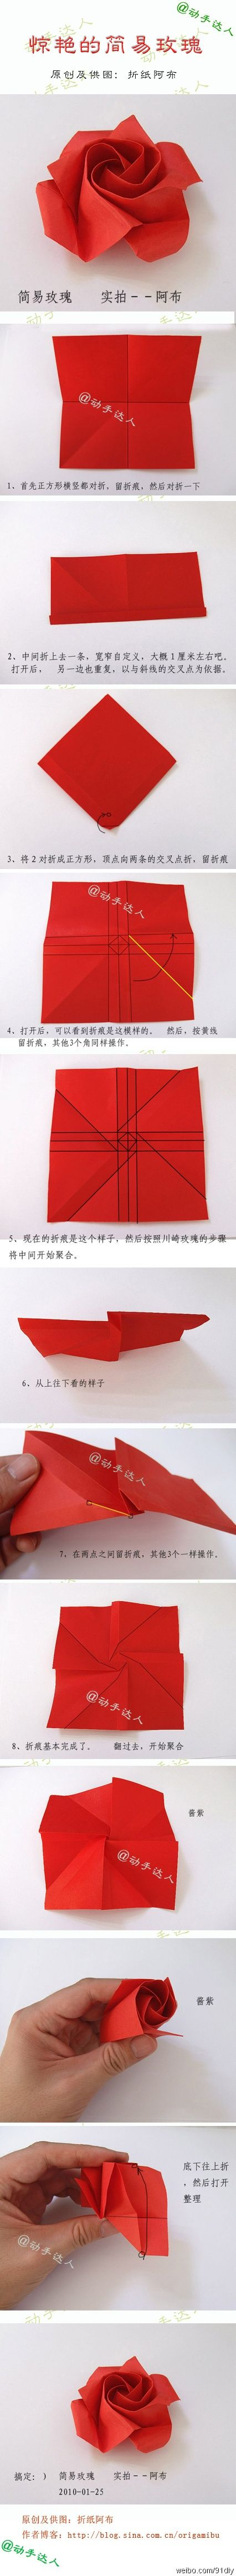 Origami Easy Rose